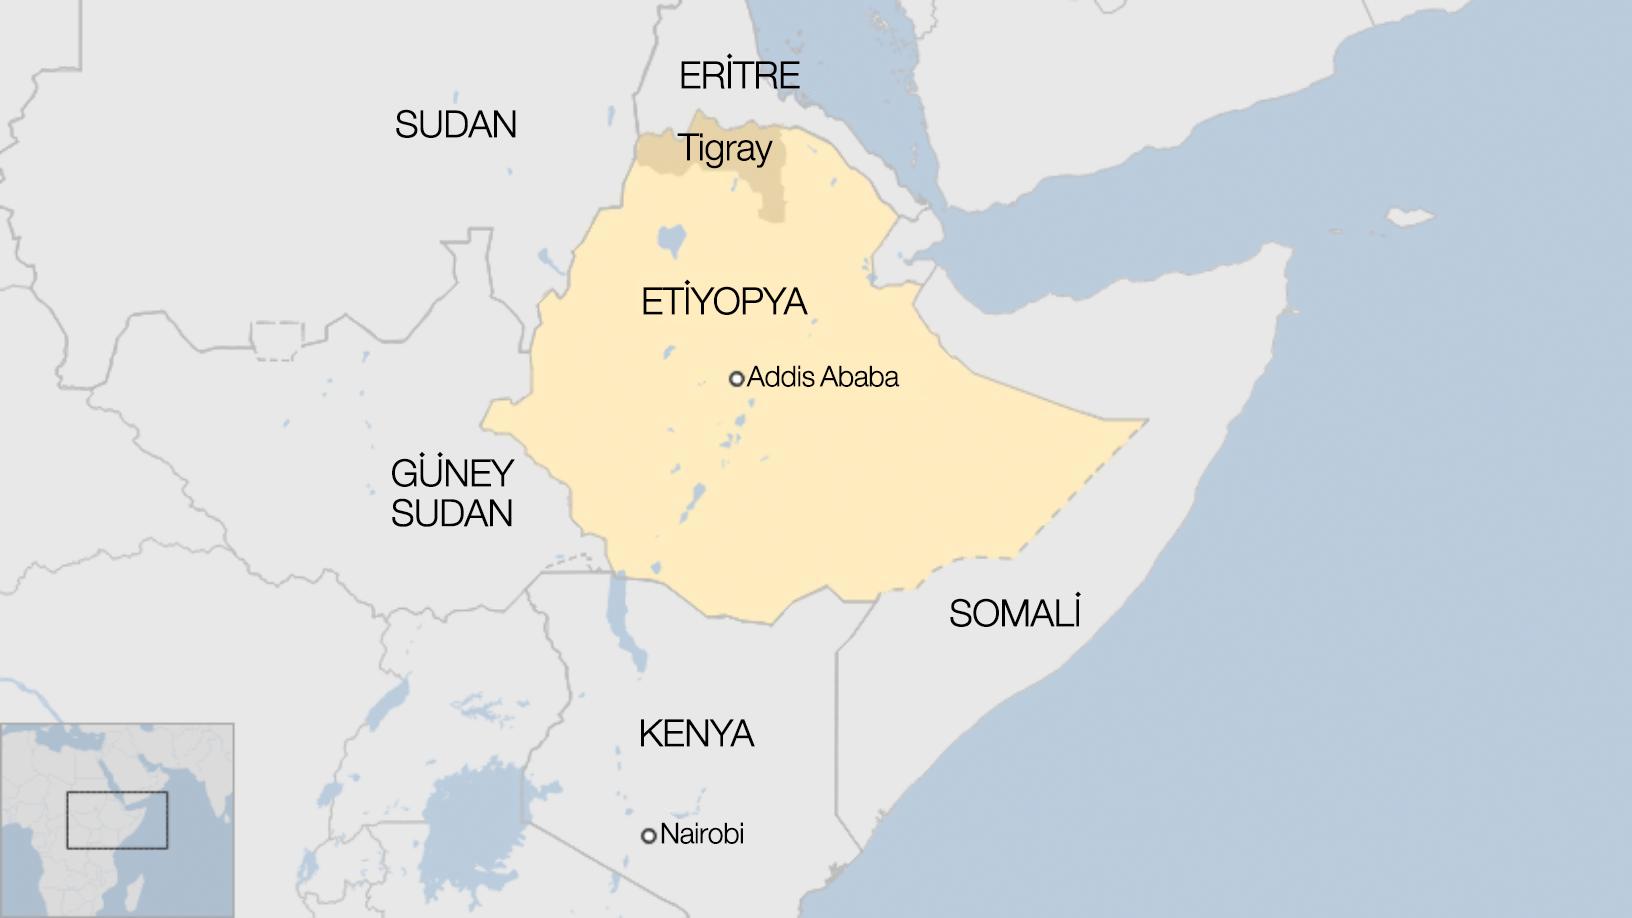 etiyopya-001.jpg